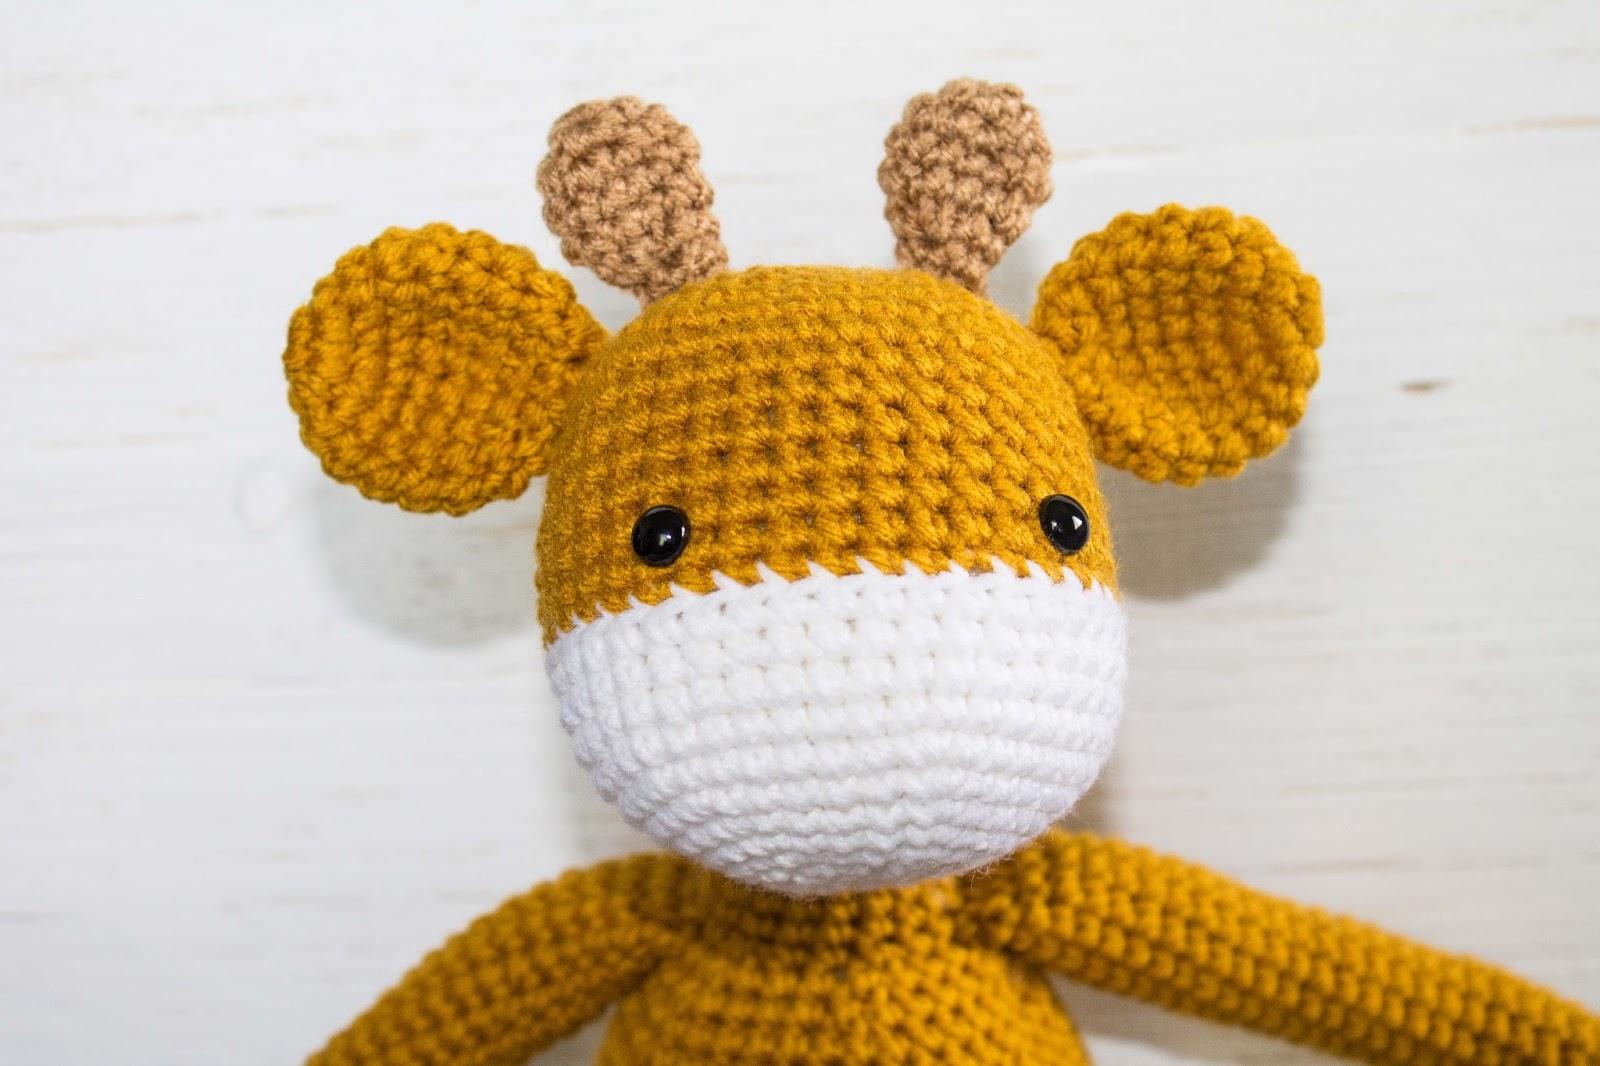 Free Crochet Pattern- The Friendly Giraffe Toy - thefriendlyredfox.com